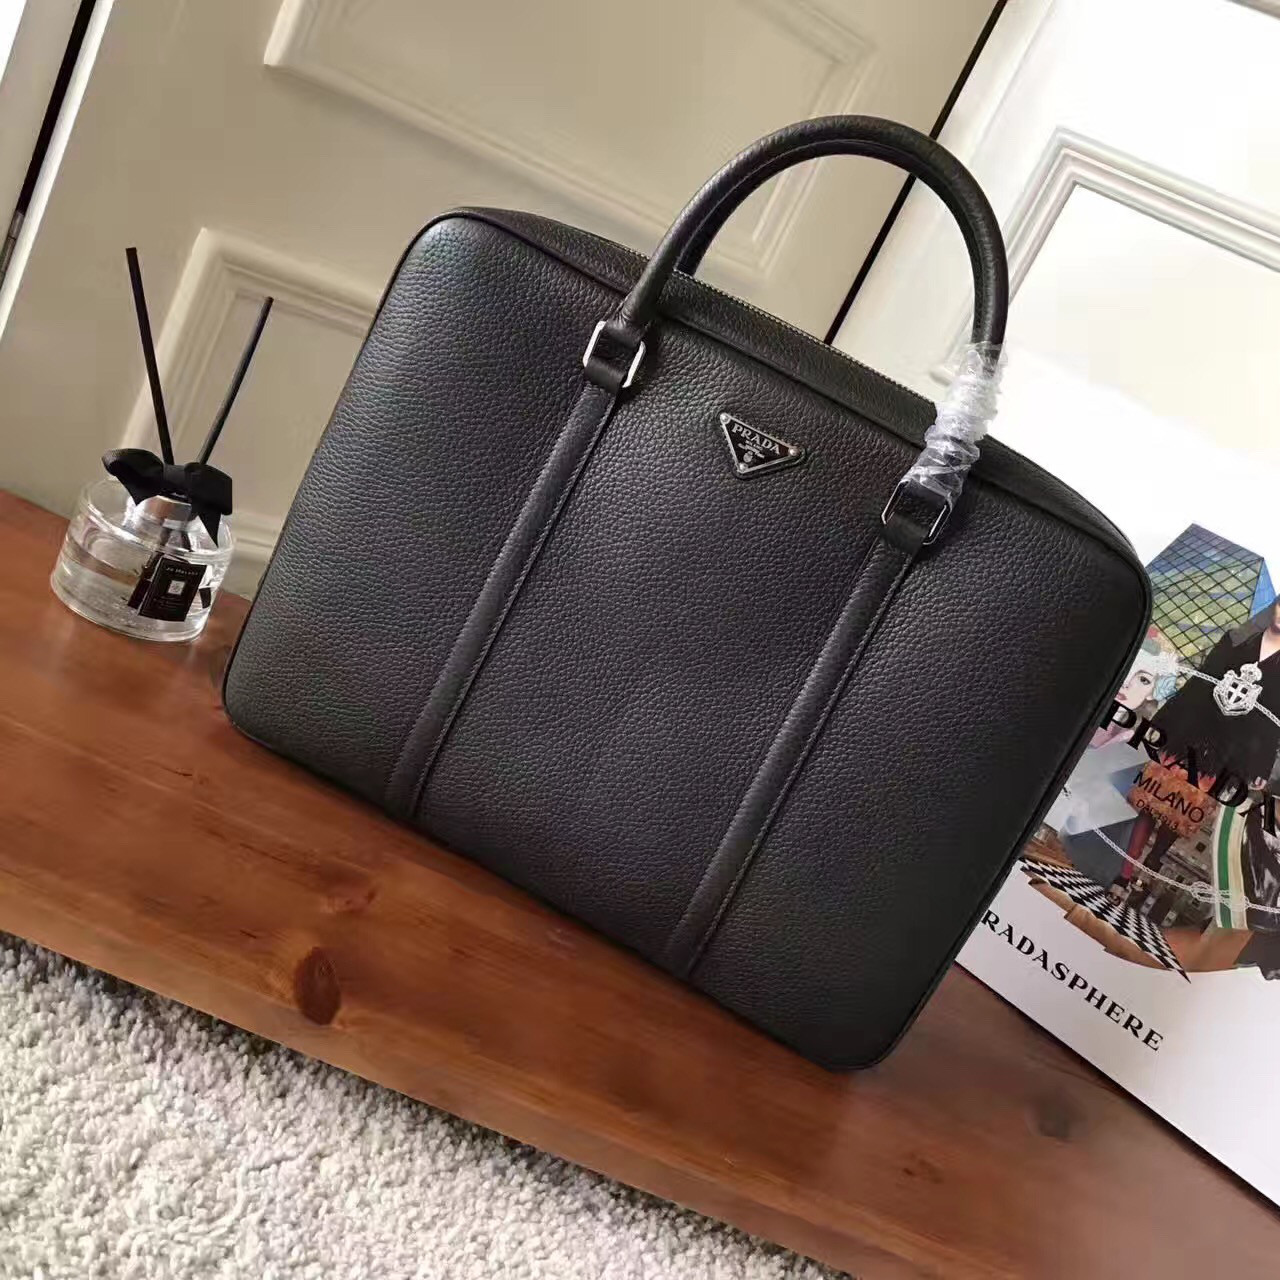 Мужская кожаная сумка - Prada